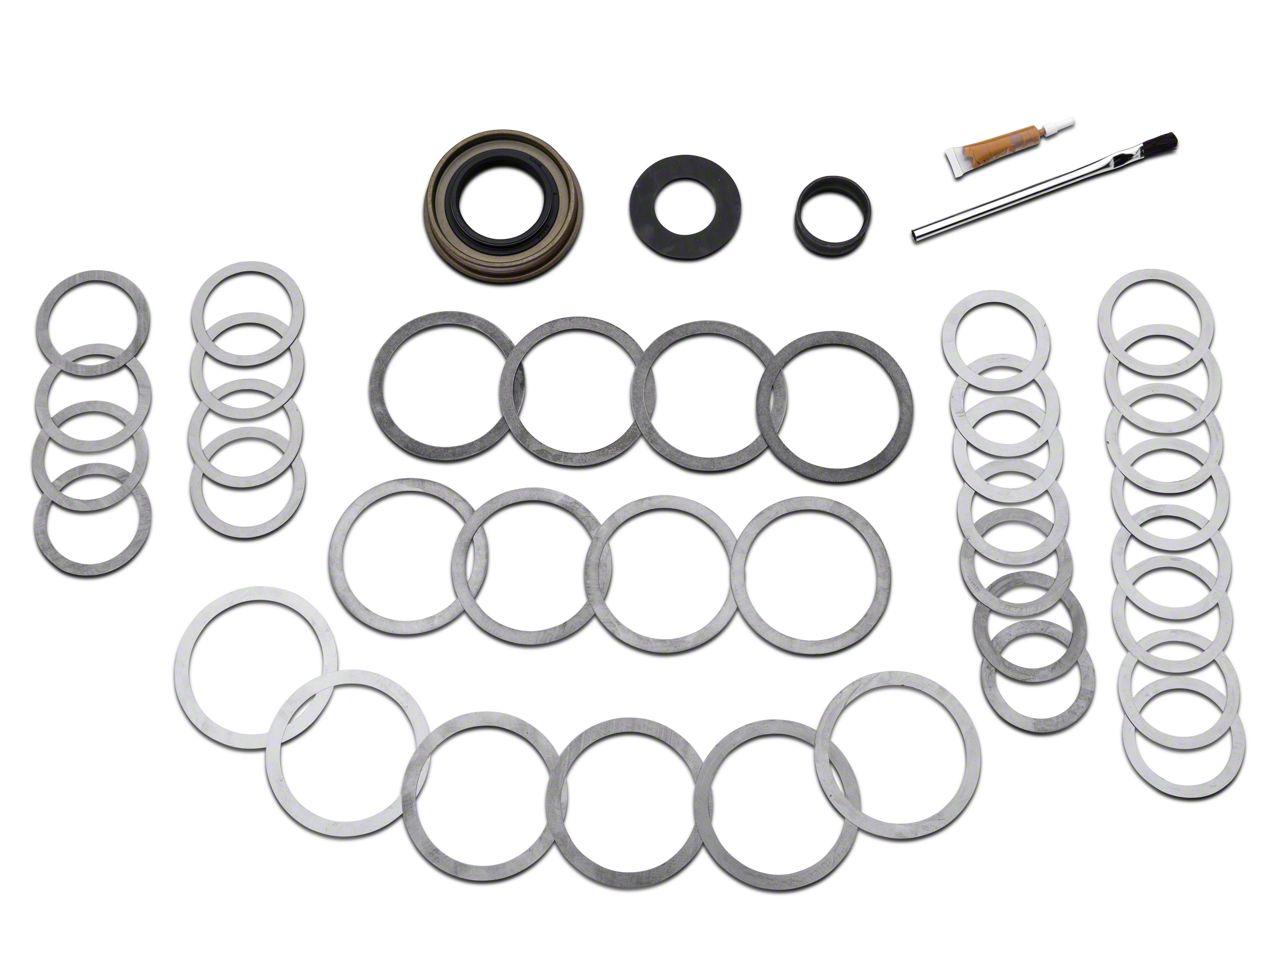 Yukon Gear Rear Dana 44 Minor Install Kit (07-18 Jeep Wrangler JK, Excluding Rubicon)